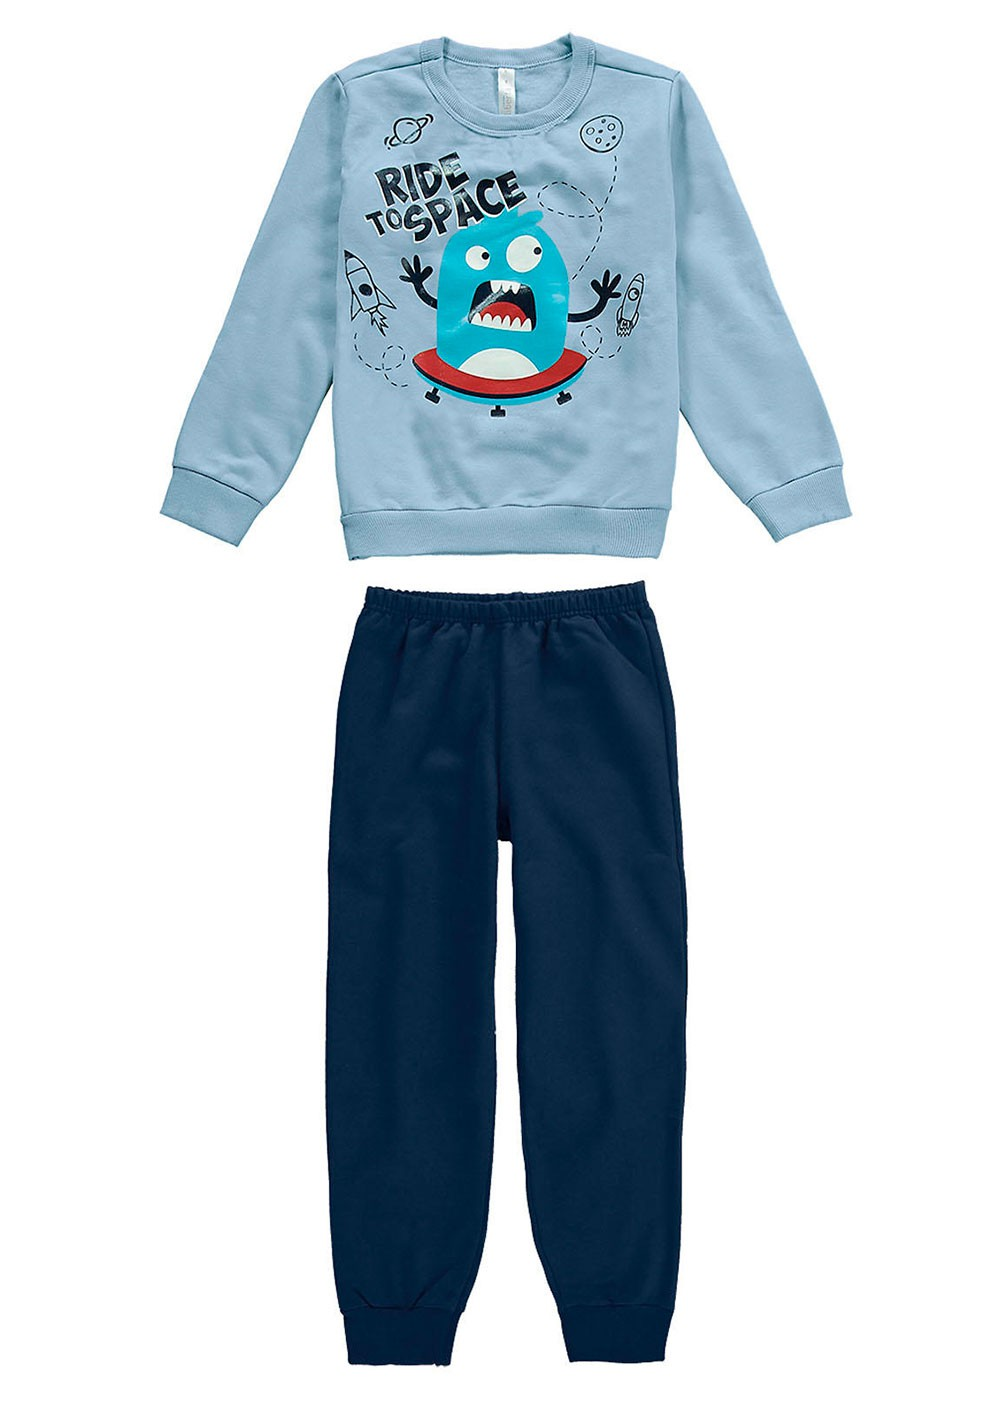 Pijama Moletom Infantil Inverno Azul Ride Malwee